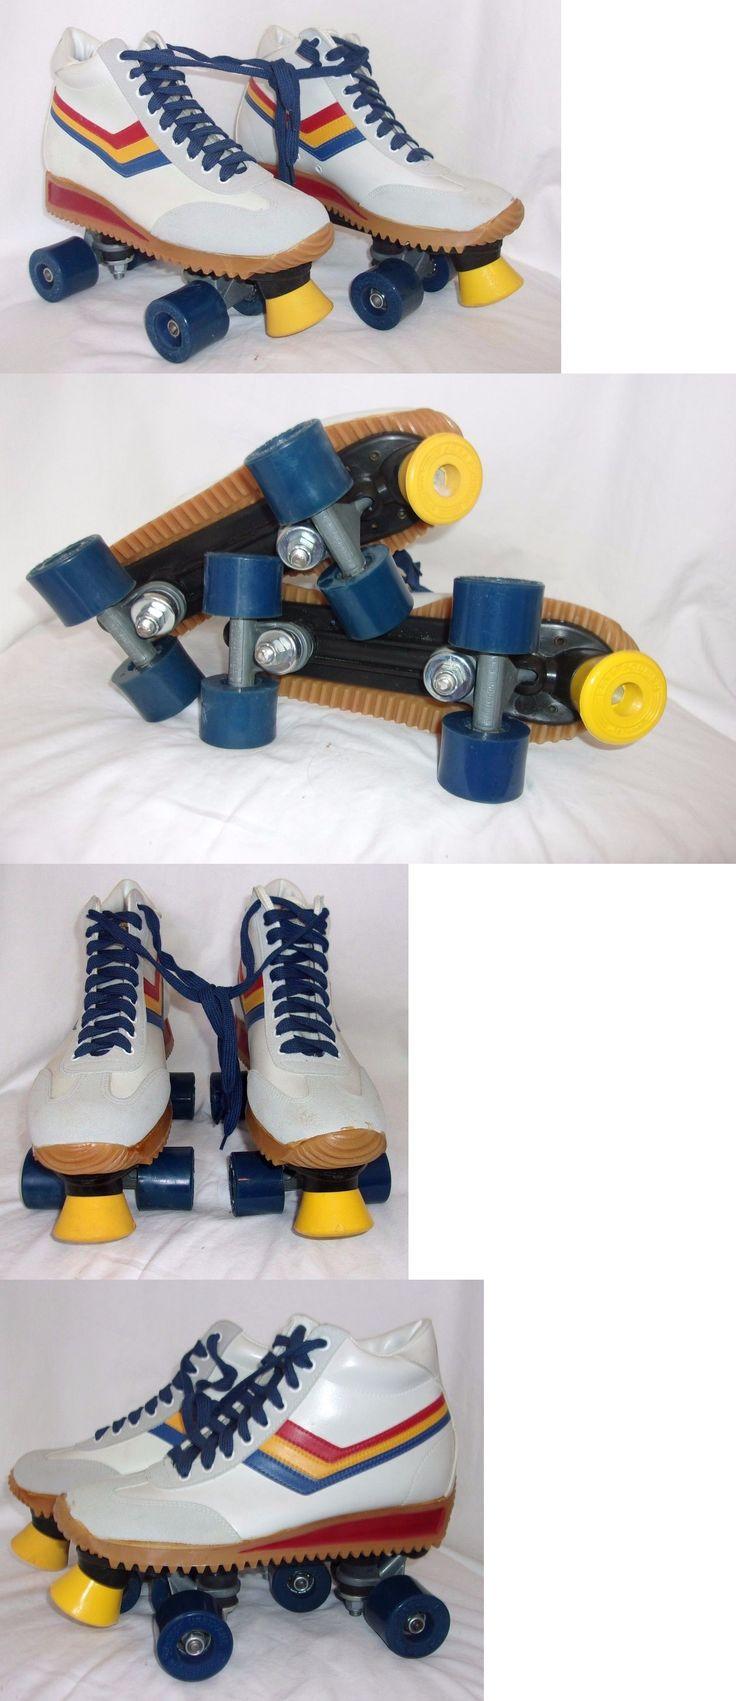 Roller skates in the 70s - Indoor Roller Skating 165938 Nos Vtg 70s Free Former White Quad Boot Roller Skates Rainbow